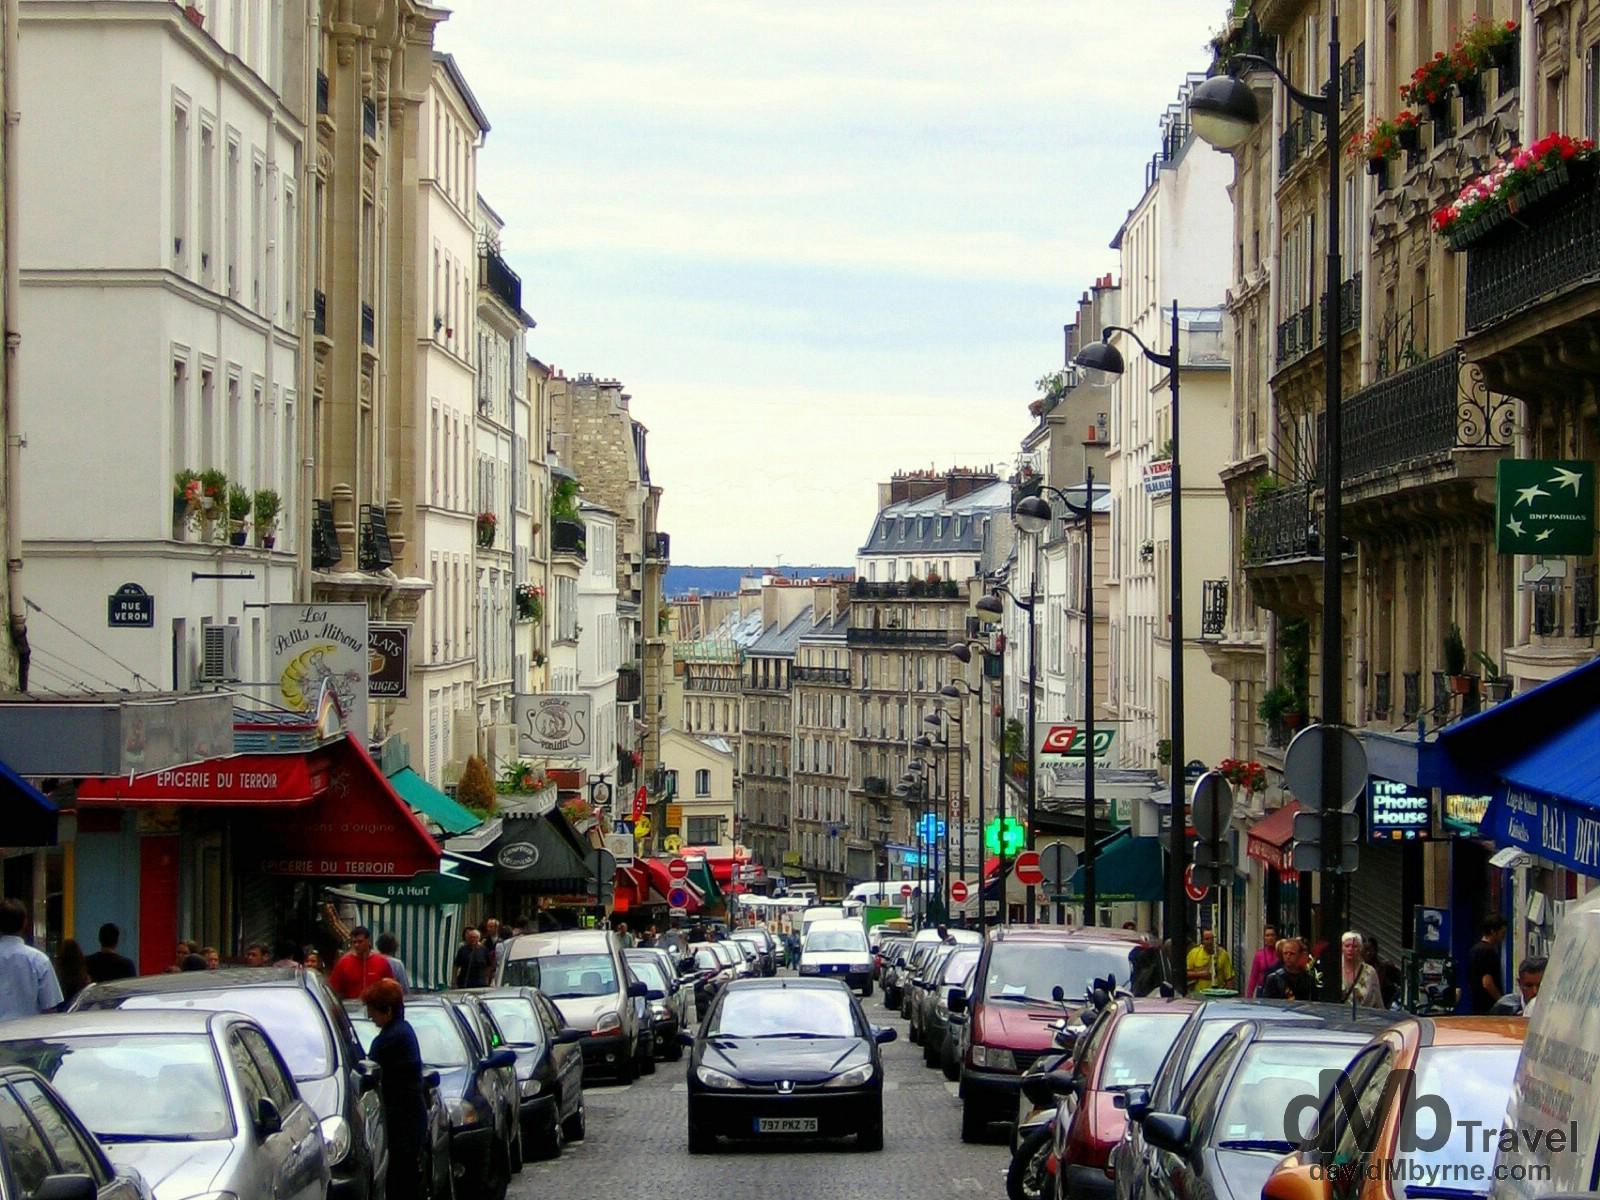 Rue Lepic, Pigalle, Paris, France. August 17th, 2007.